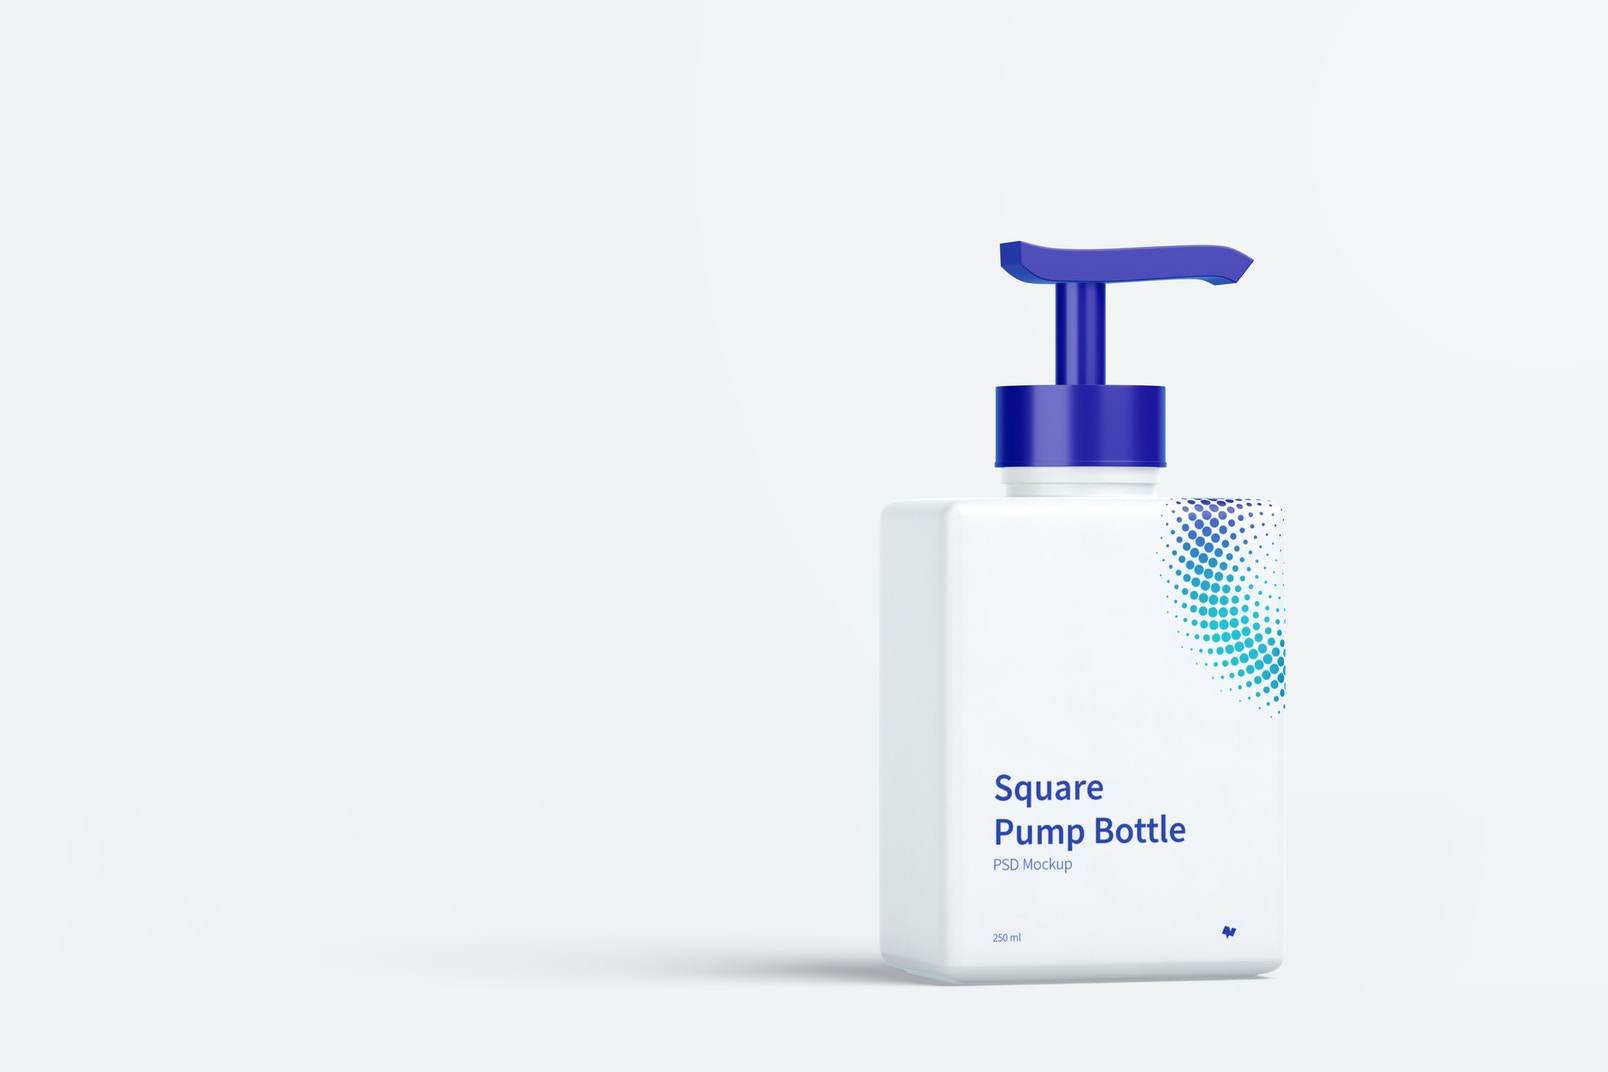 250 ml Square Pump Bottle Mockup, Front View 04